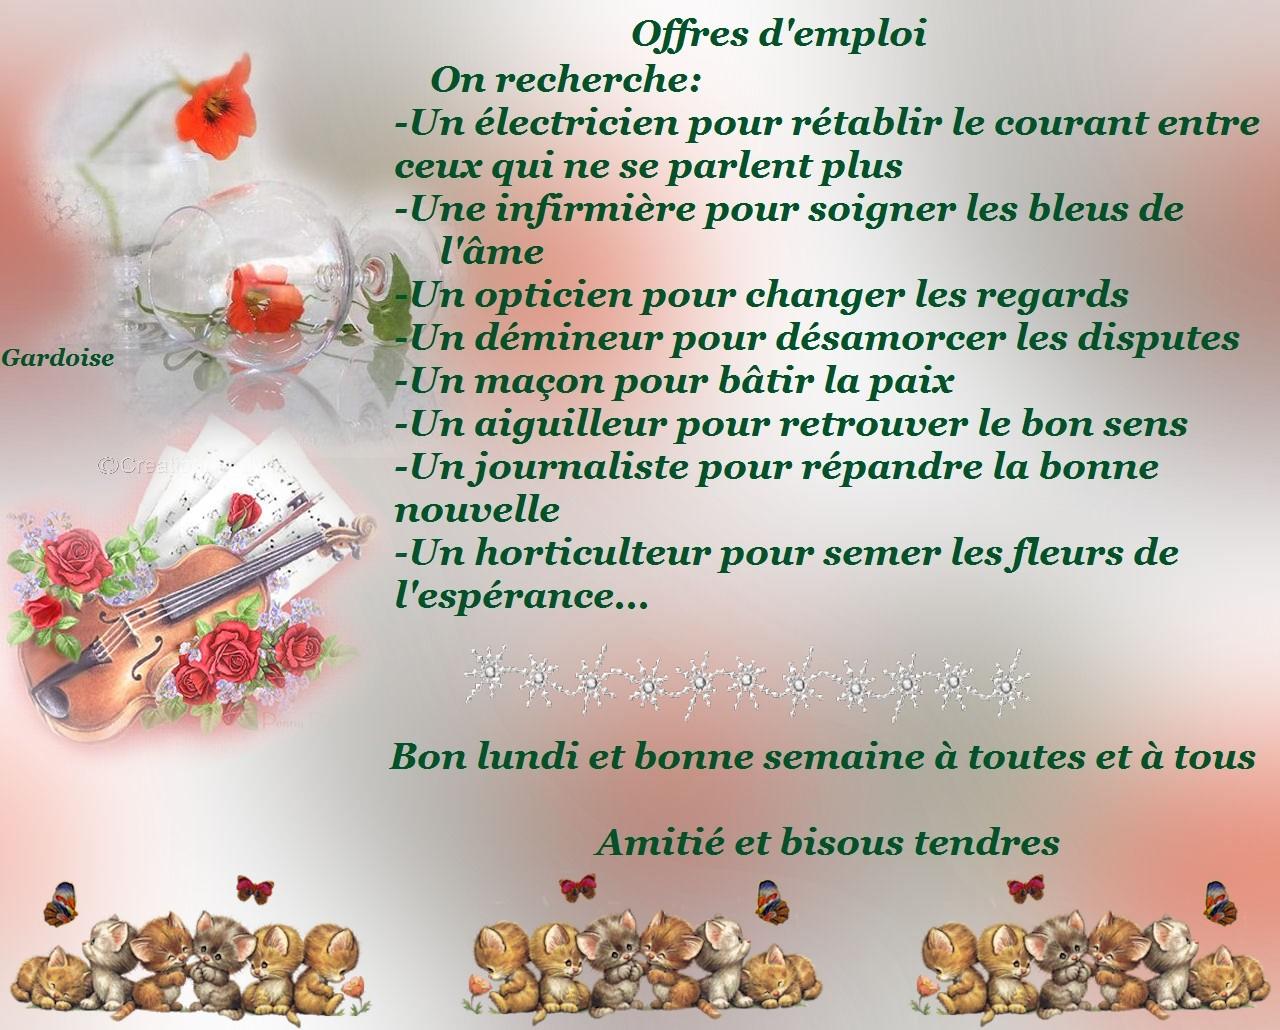 http://photo.ma-bimbo.com/fr/26/12619/moy/10094747.jpg